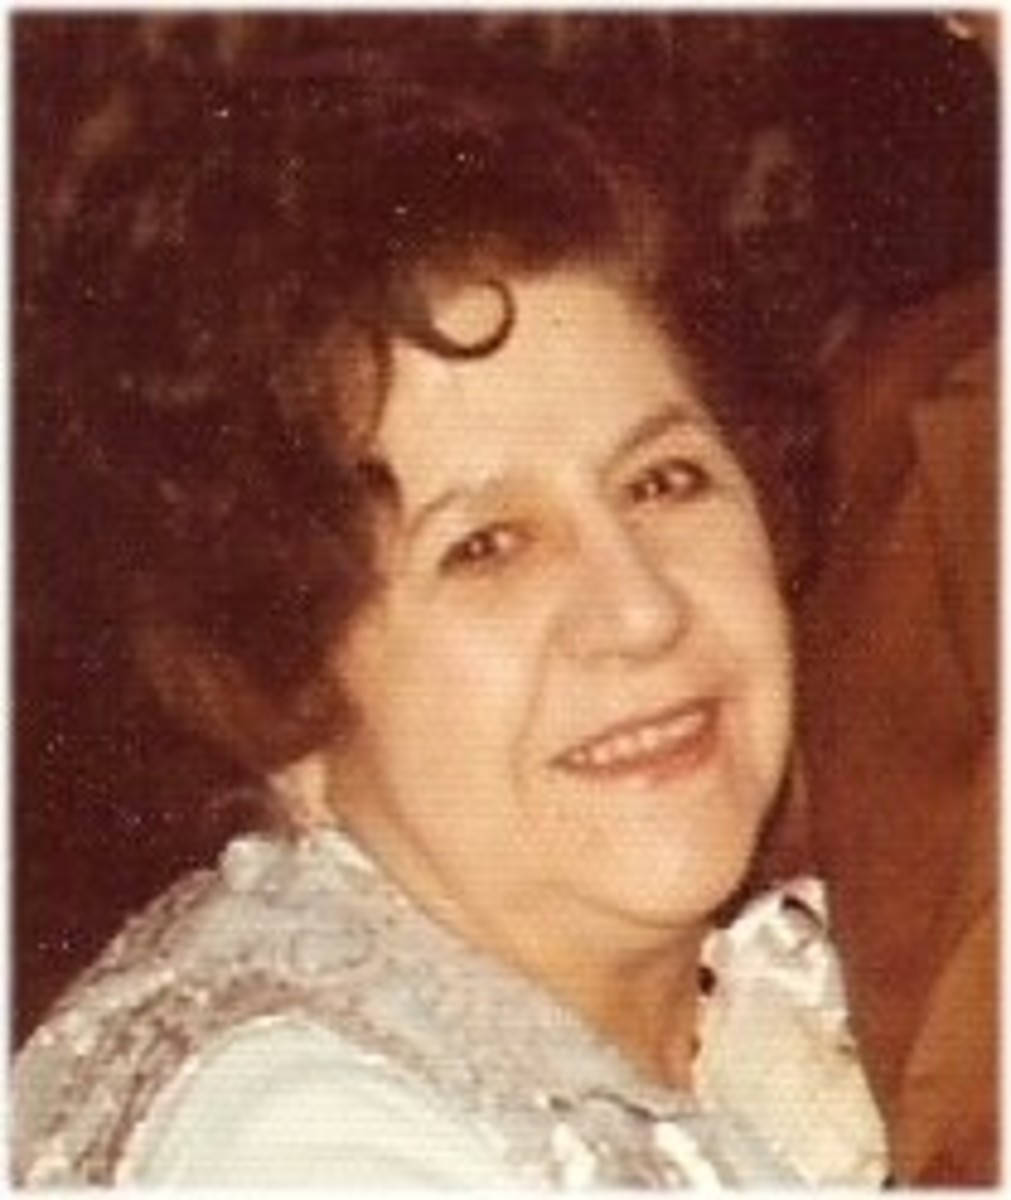 My mother:  Maria Giuseppina Bevilacqua (nee Regine) - 1908-1986 - What a cook!